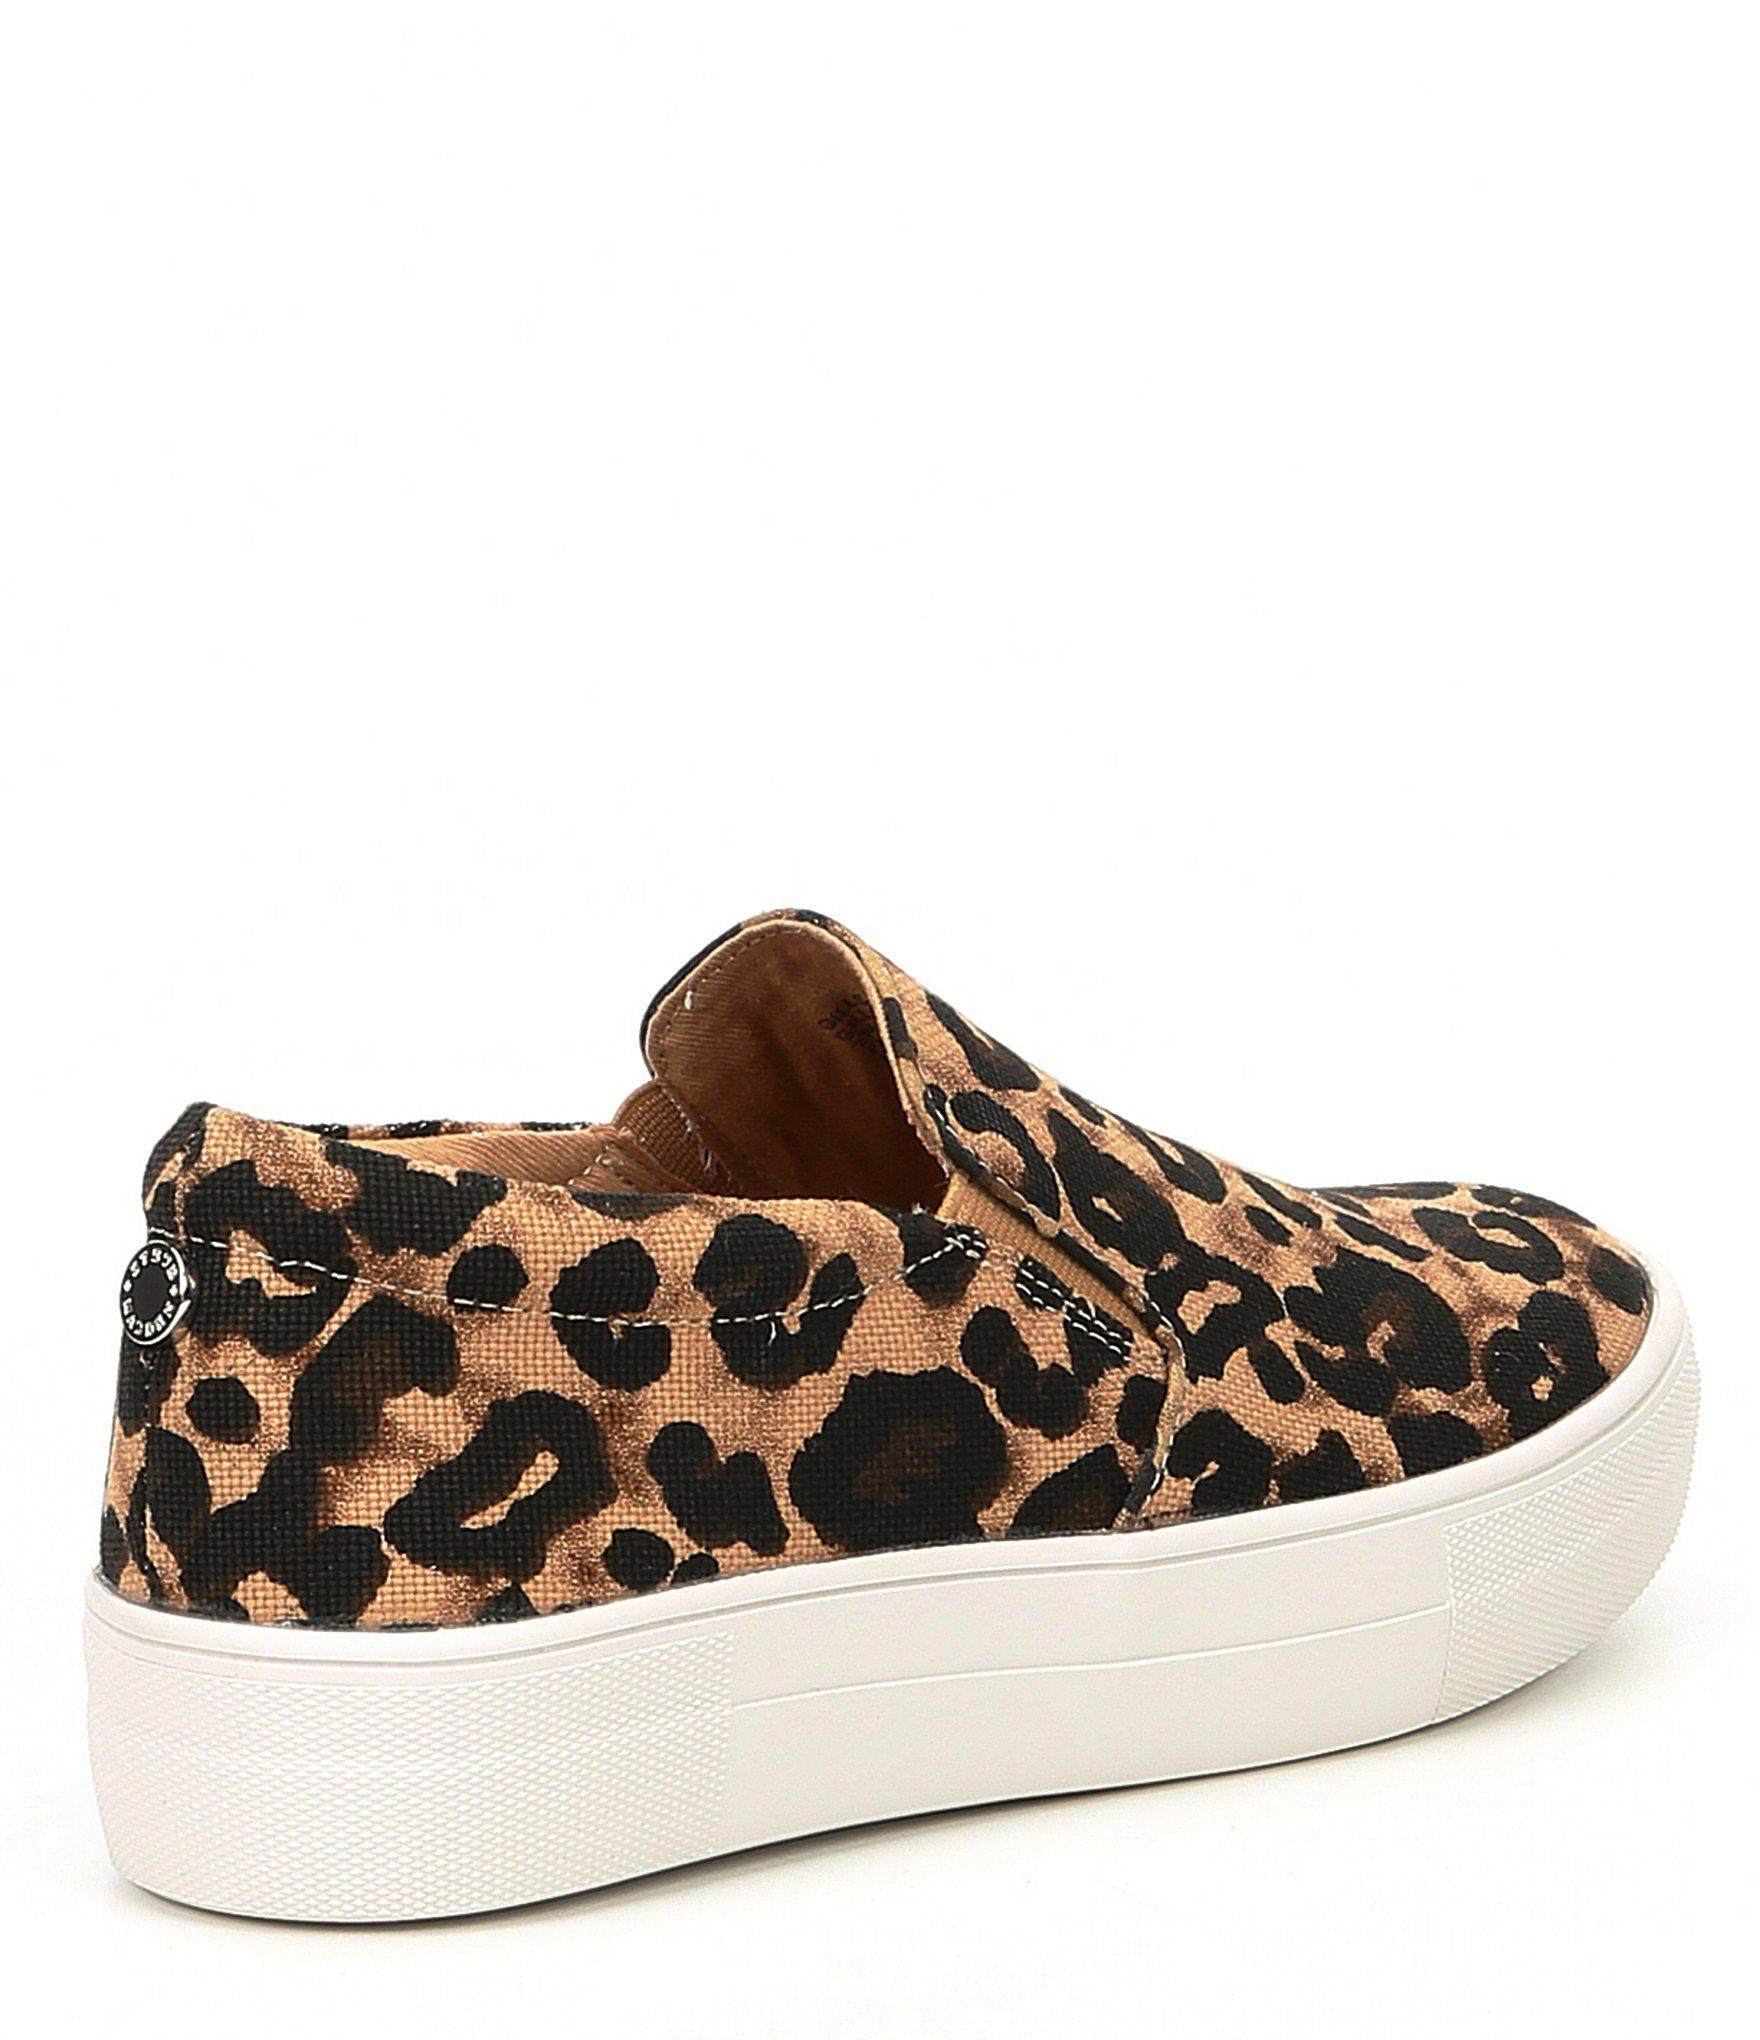 49016b6fe3b1 ... Brown Gills Leopard Print Platform Sneakers - Lyst. View fullscreen